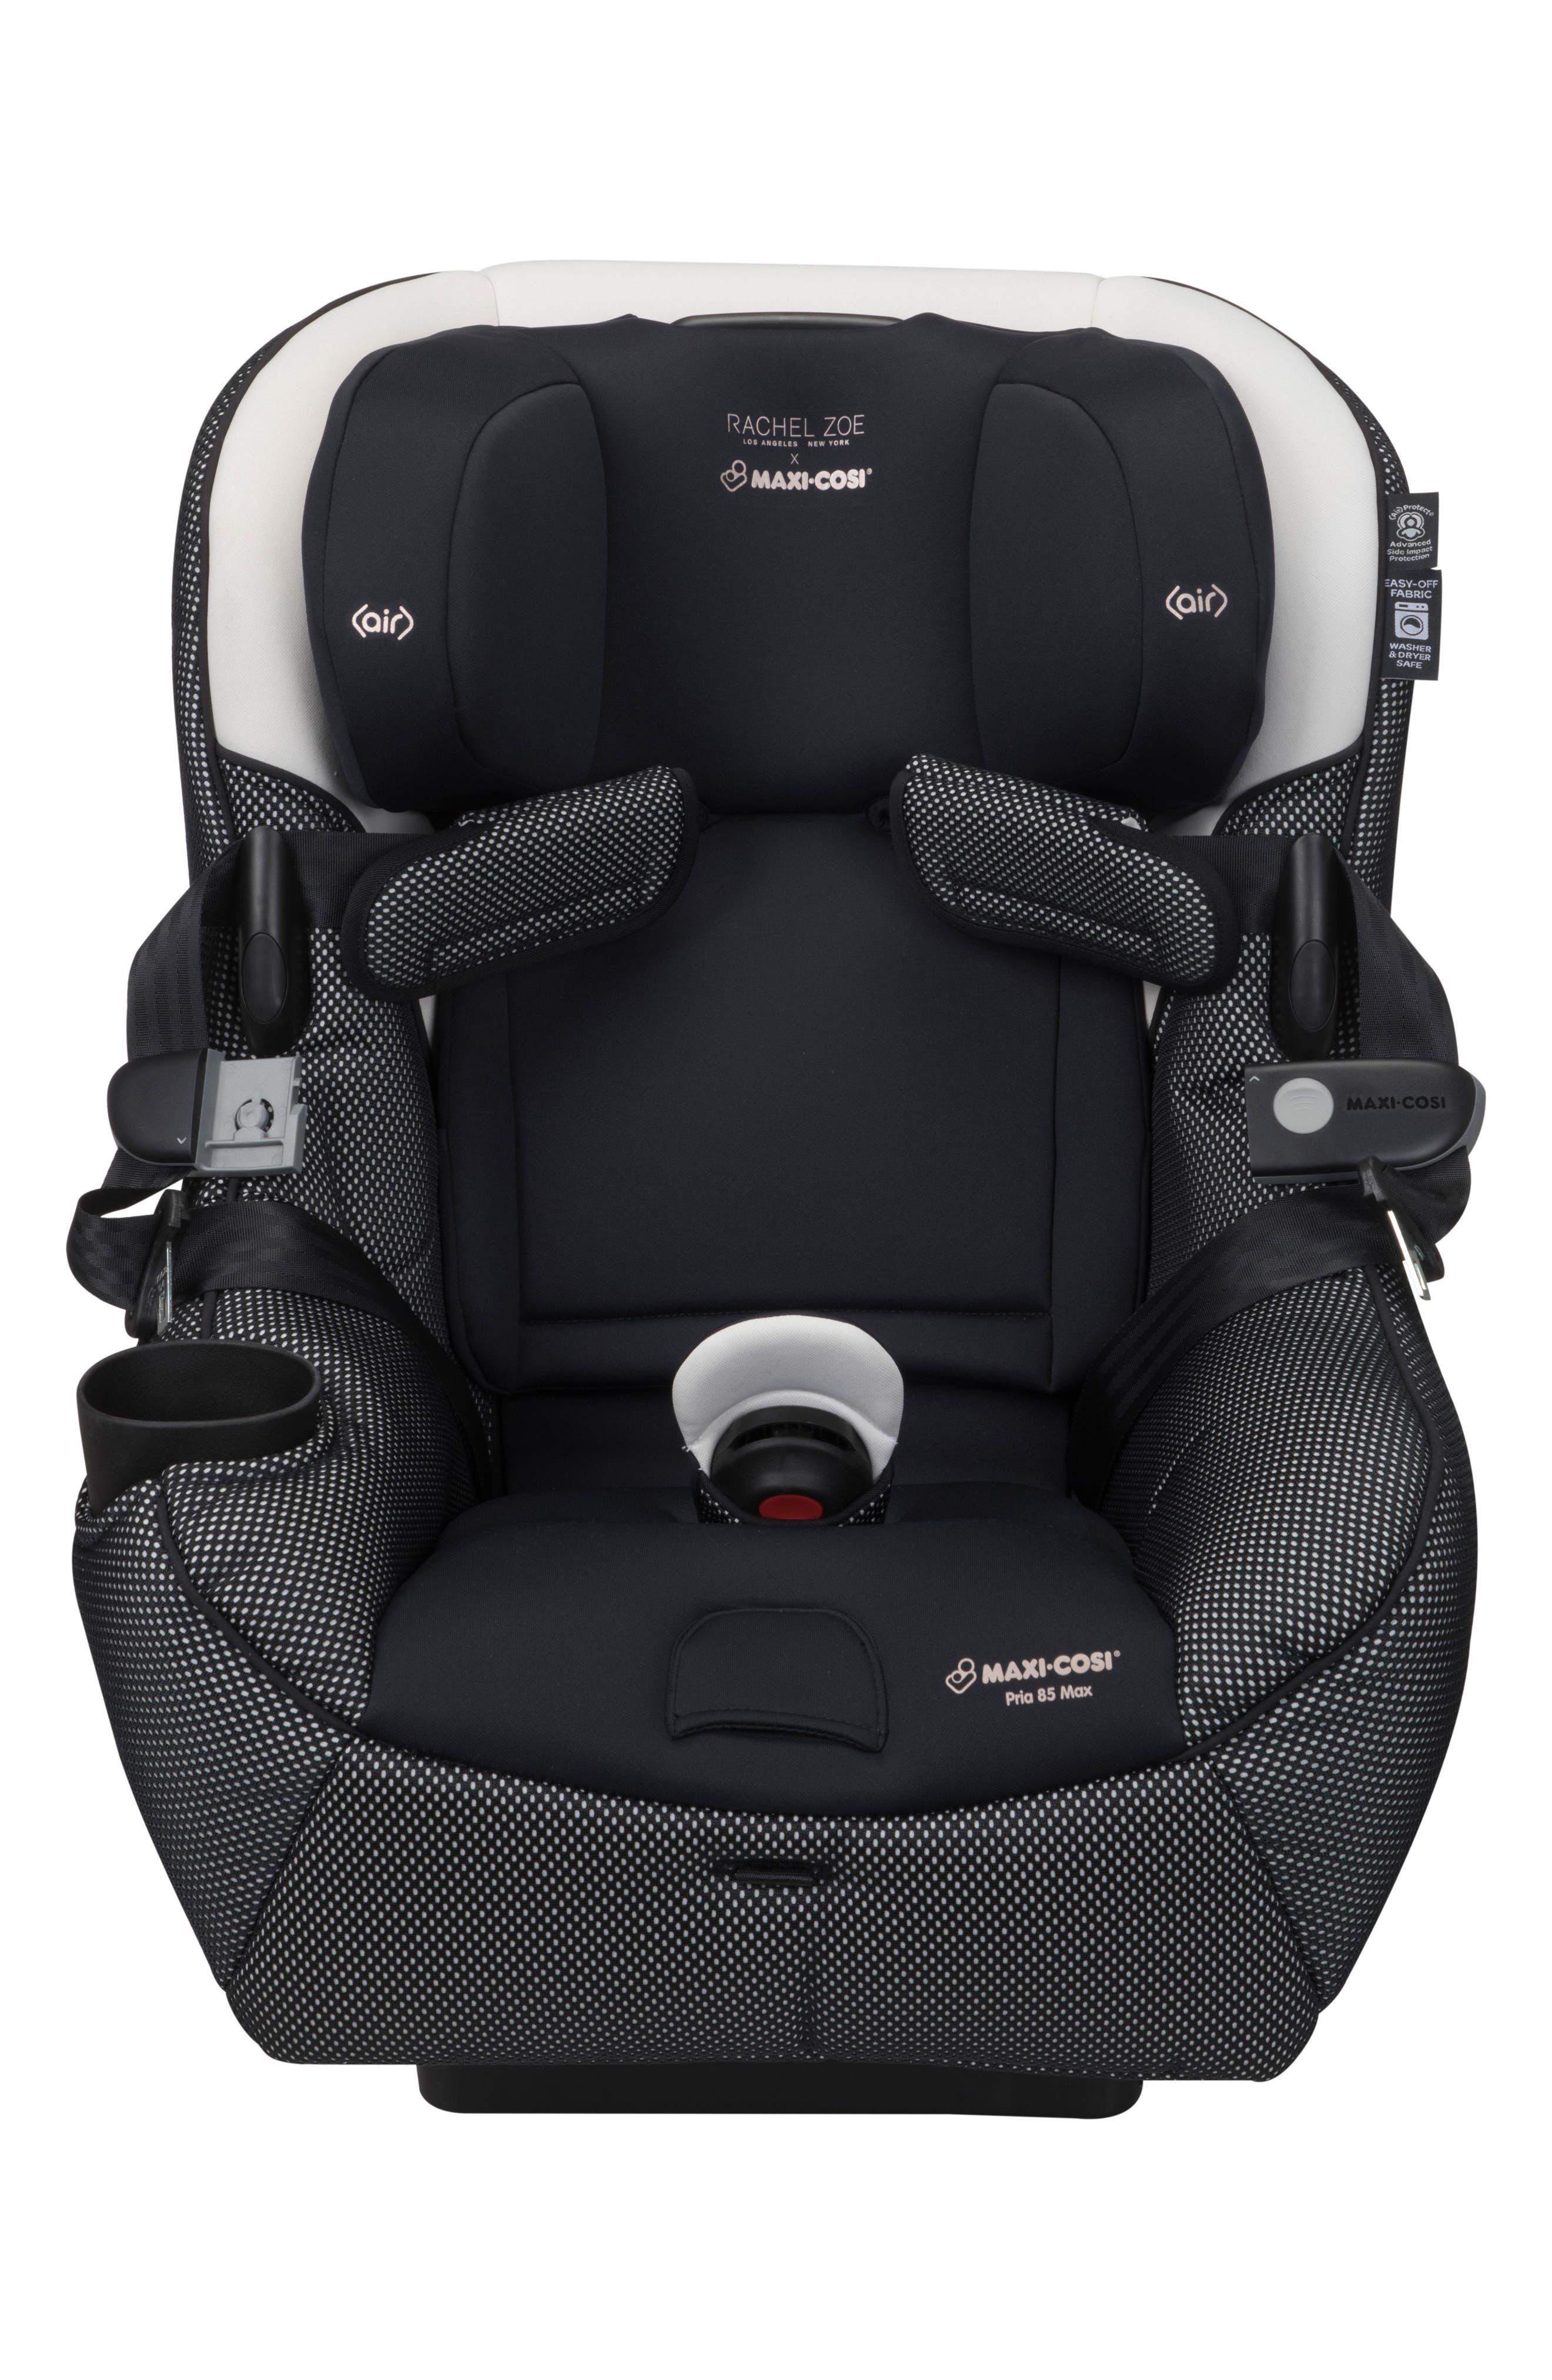 MAXI-COSI<SUP>®</SUP>,                             x Rachel Zoe Pria<sup>™</sup> 85 Luxe Sport Max Convertible Car Seat,                             Alternate thumbnail 5, color,                             001